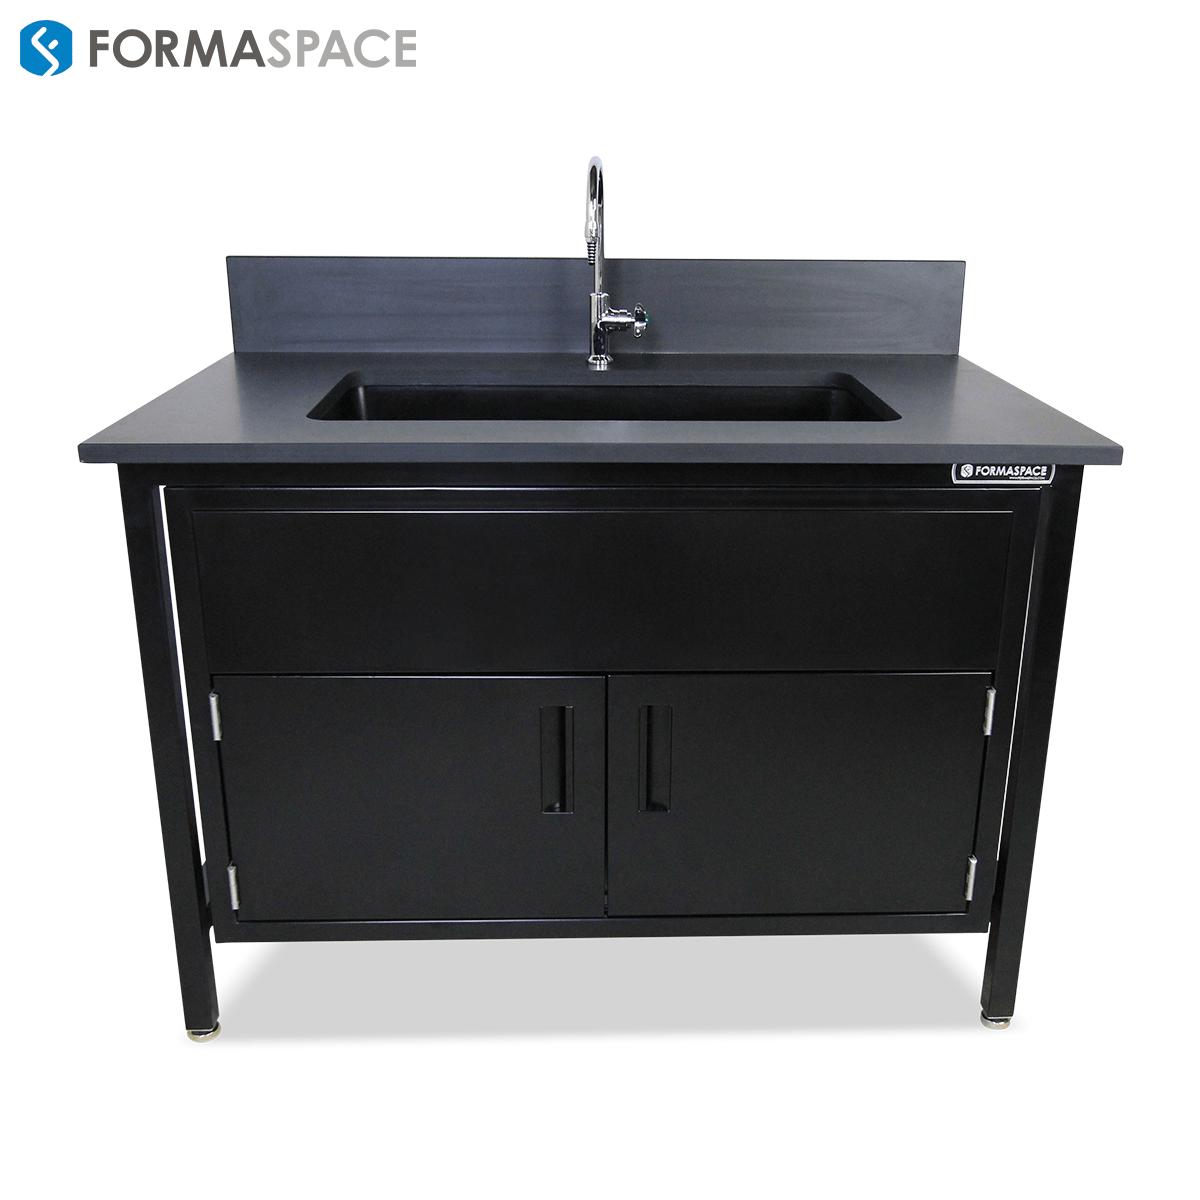 Epoxy Sink with Steel Cabinet | Formaspace